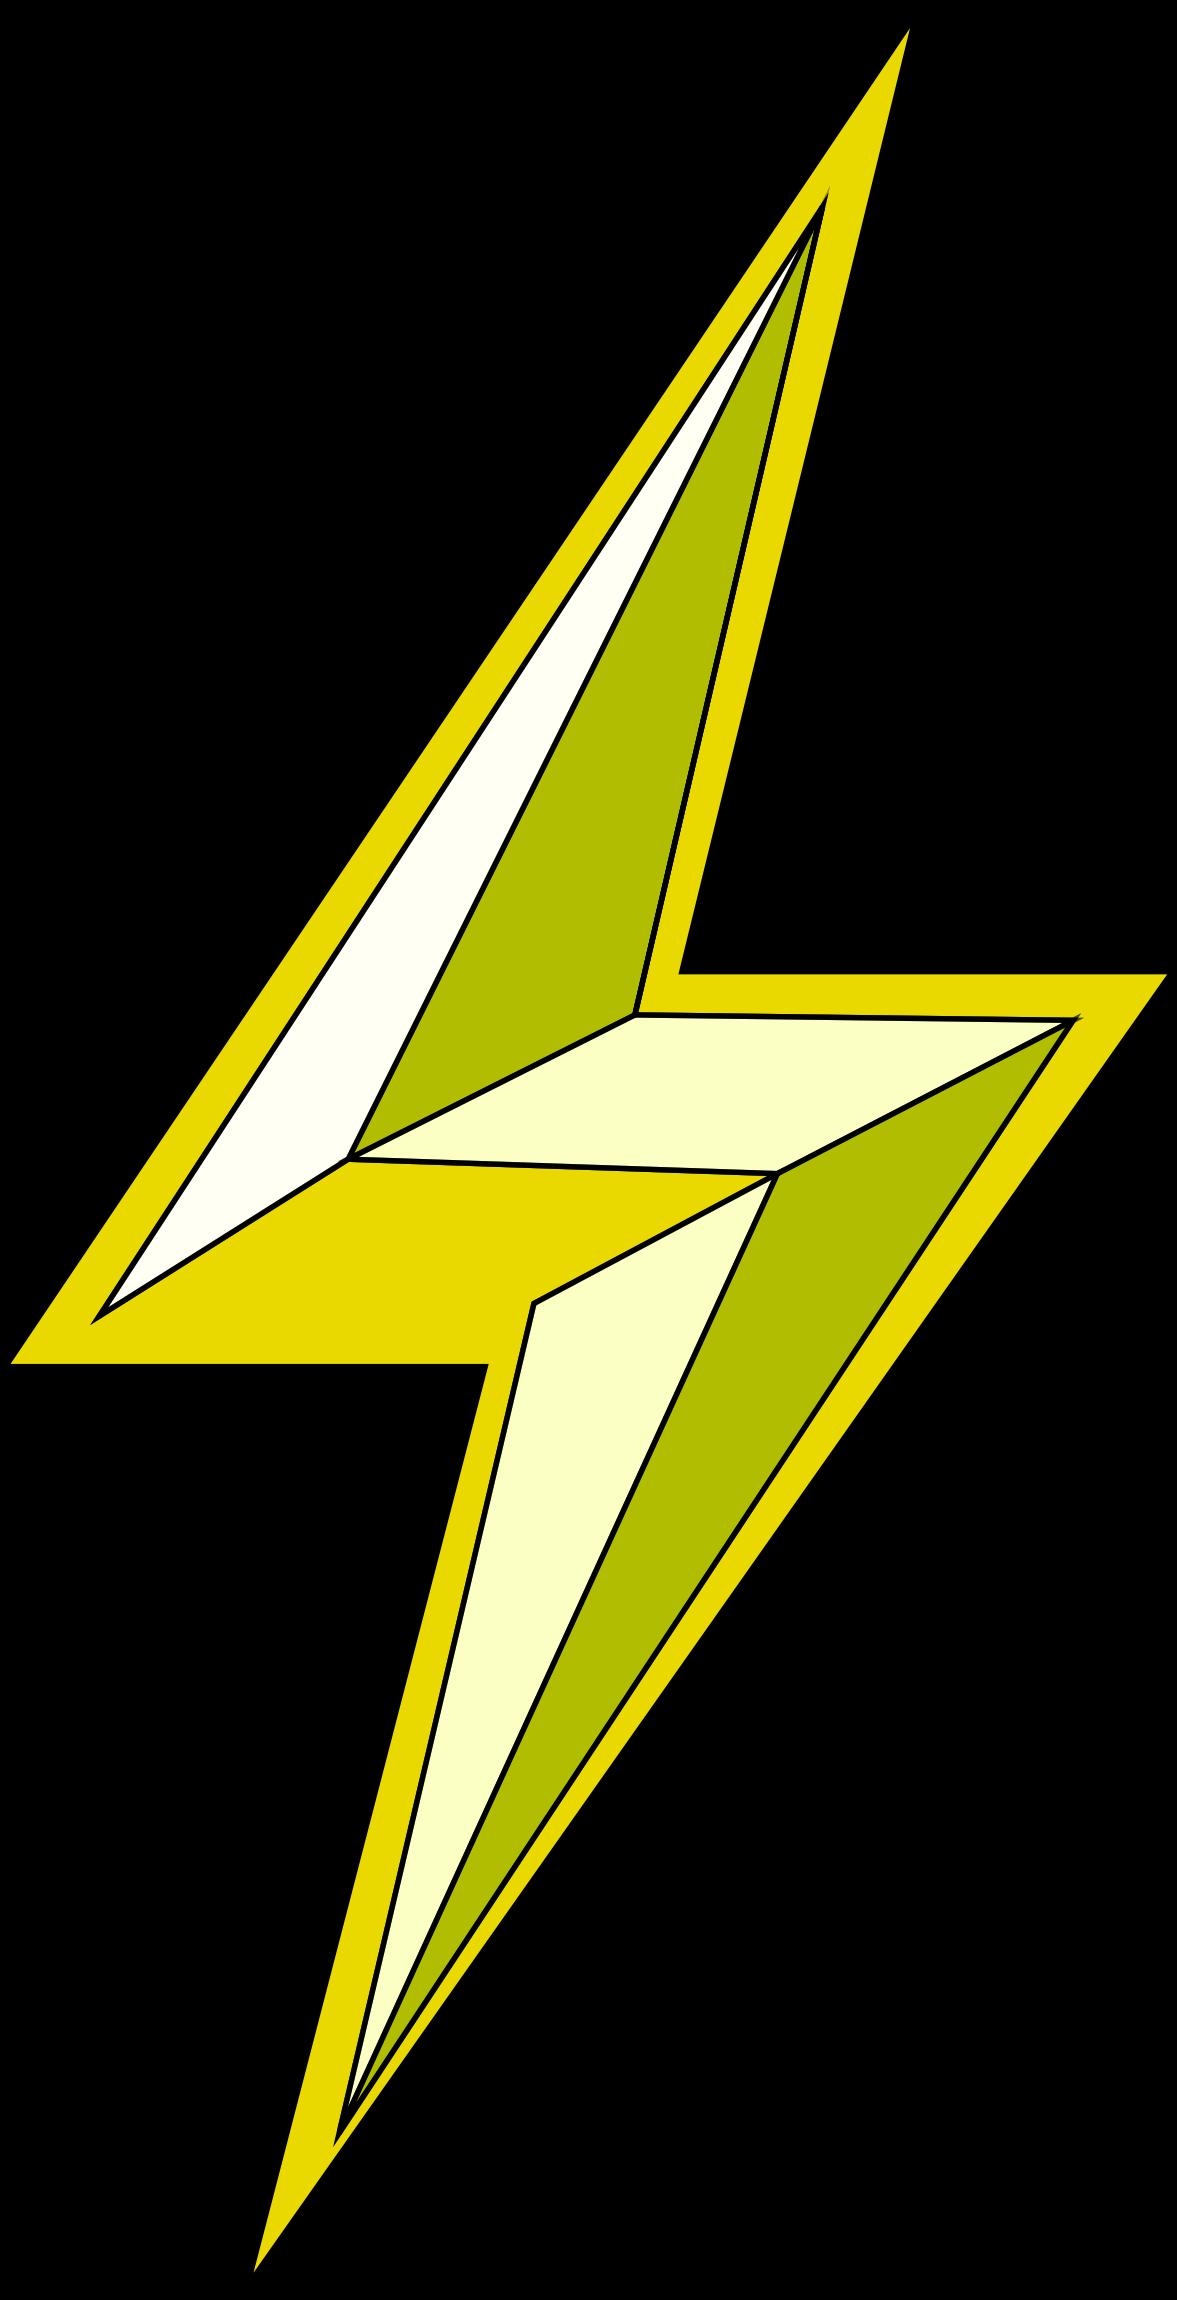 lightning clipart stylized